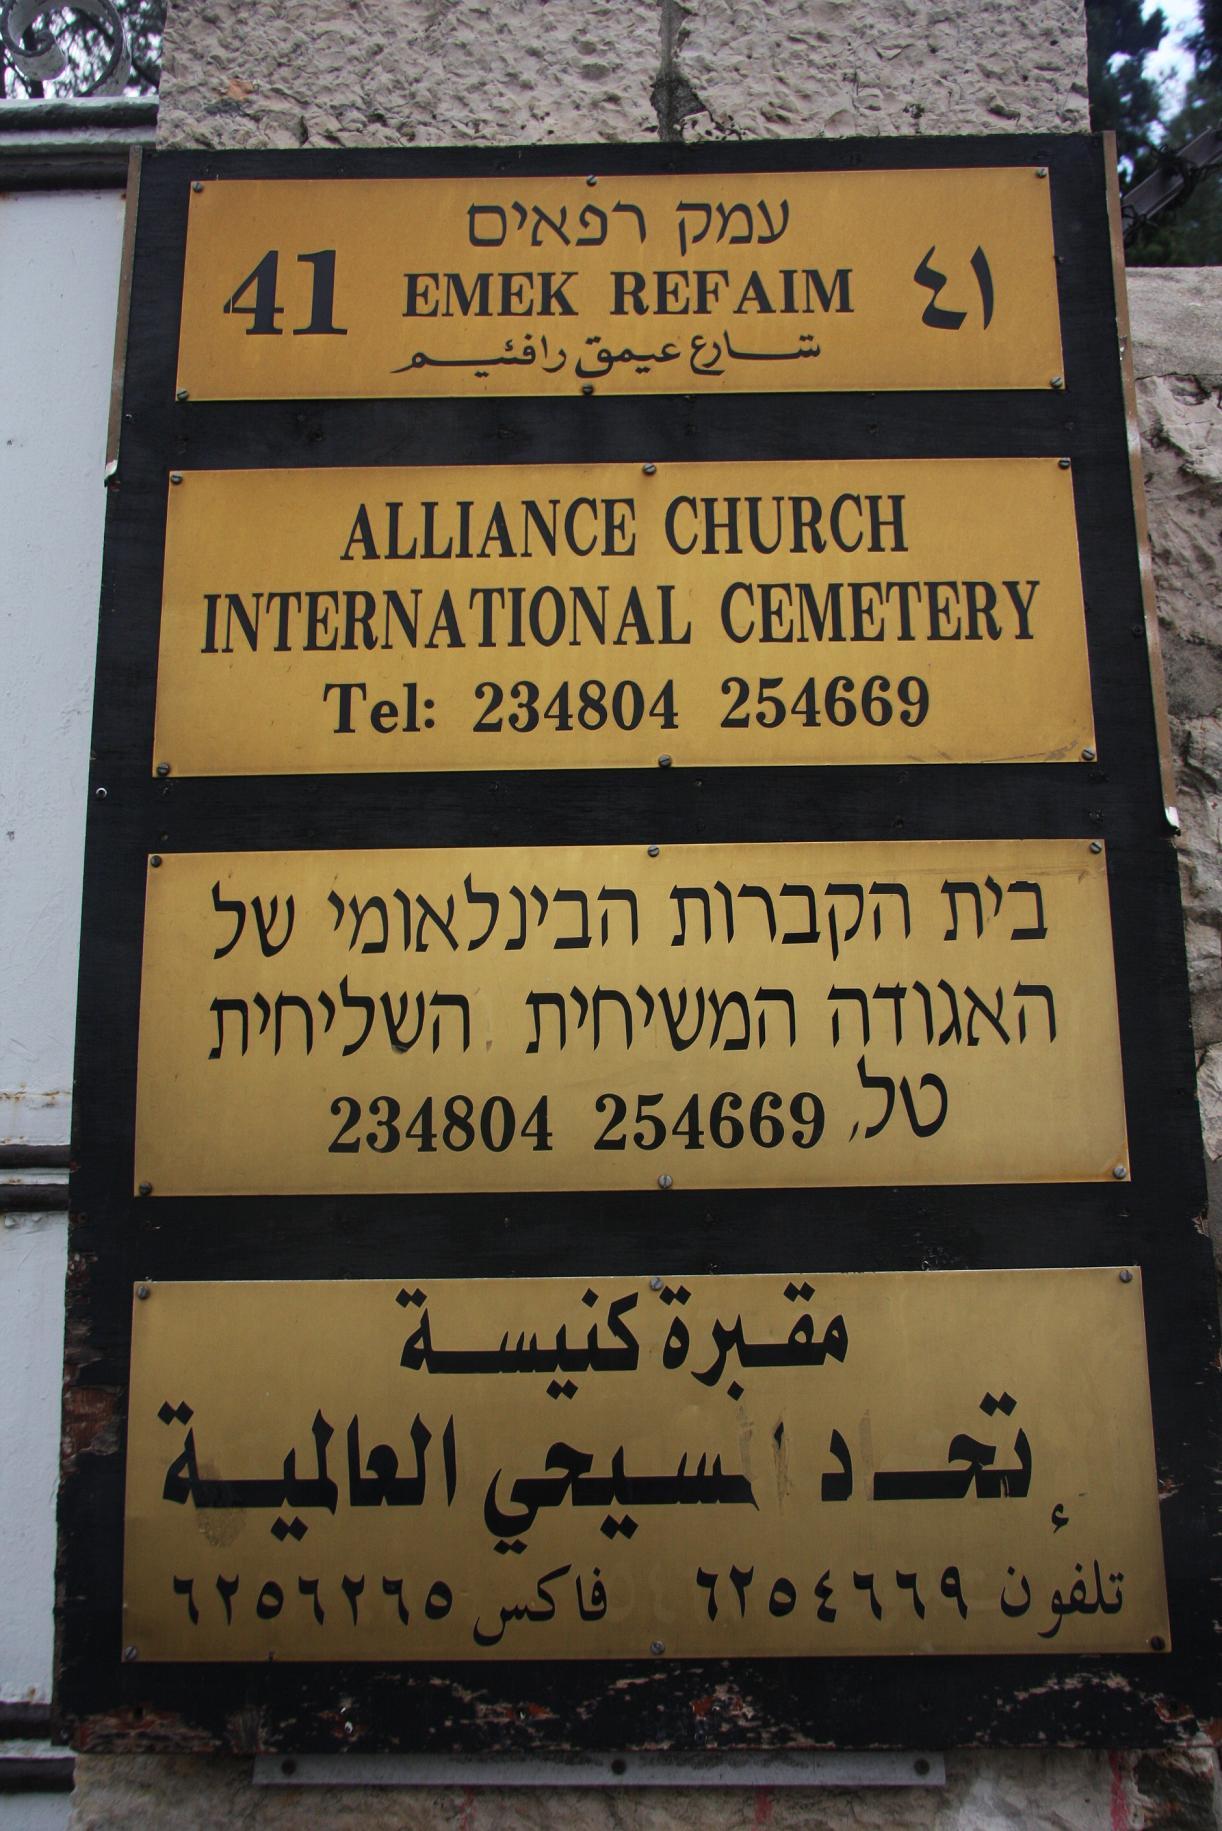 Alliance Church International Cemetery